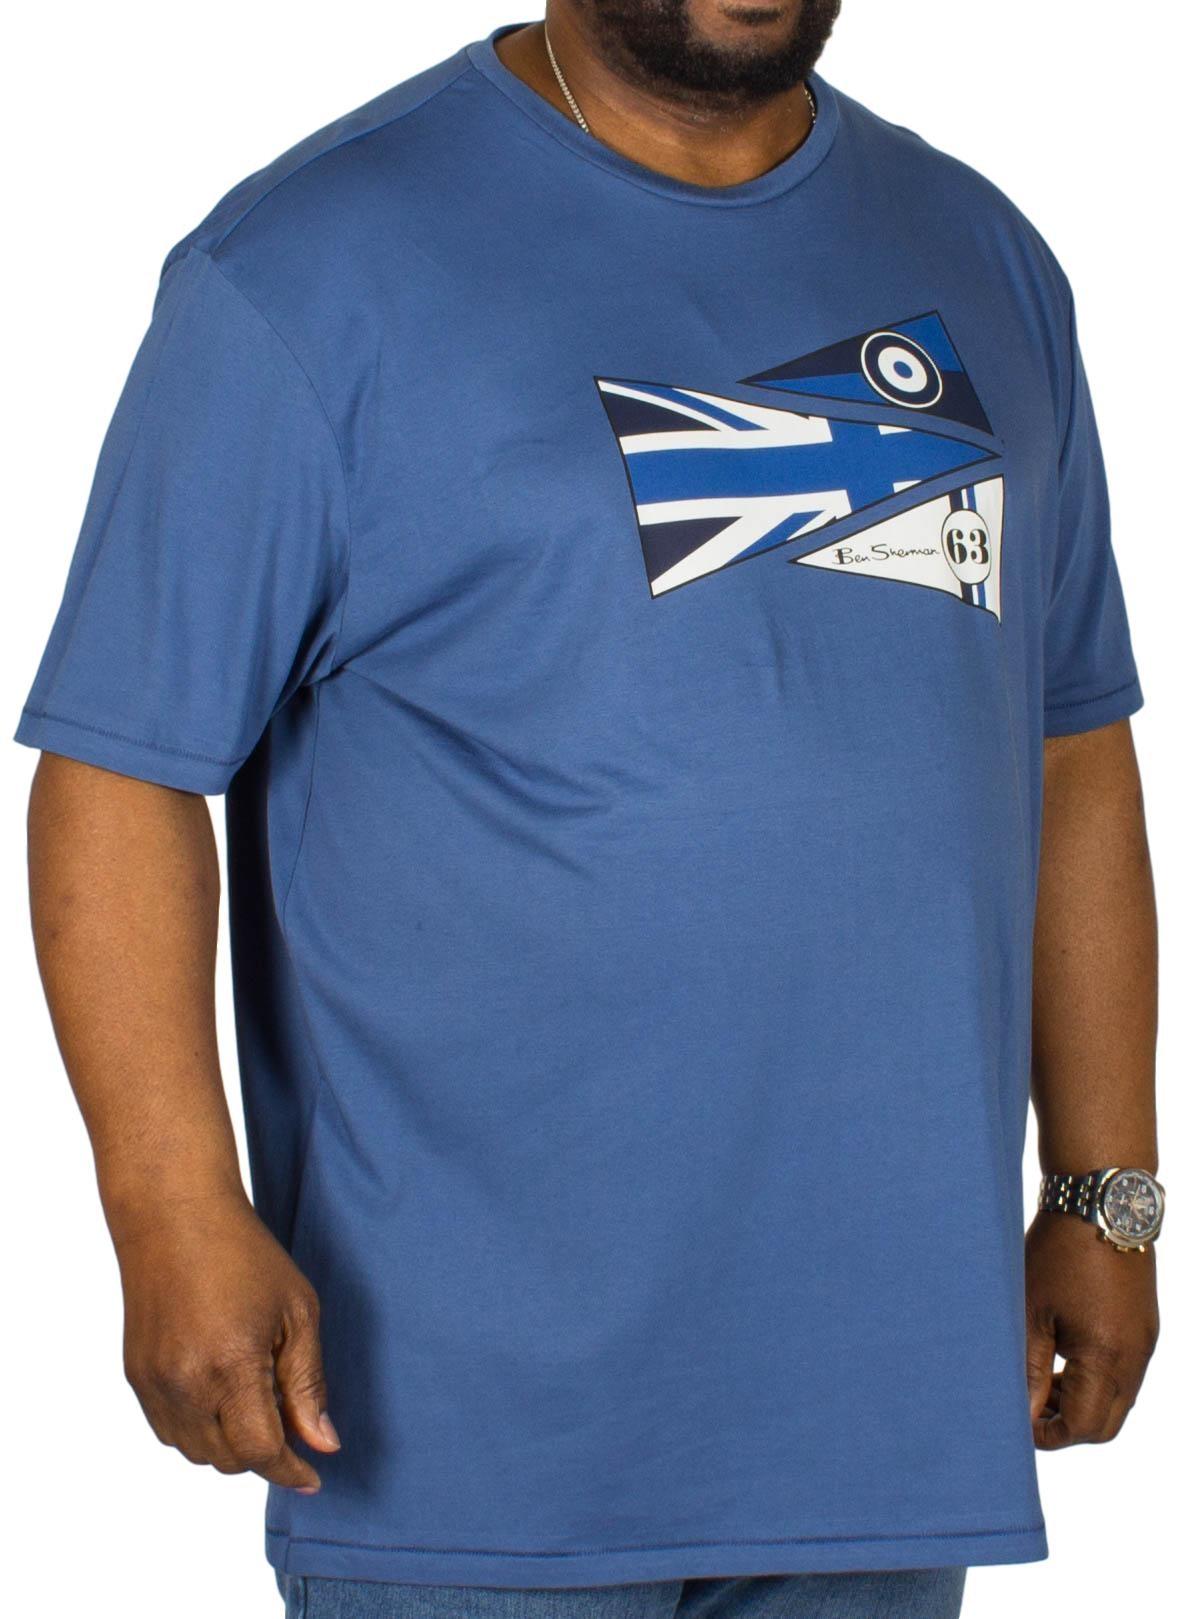 Ben Sherman Pennants T-Shirt Indigo